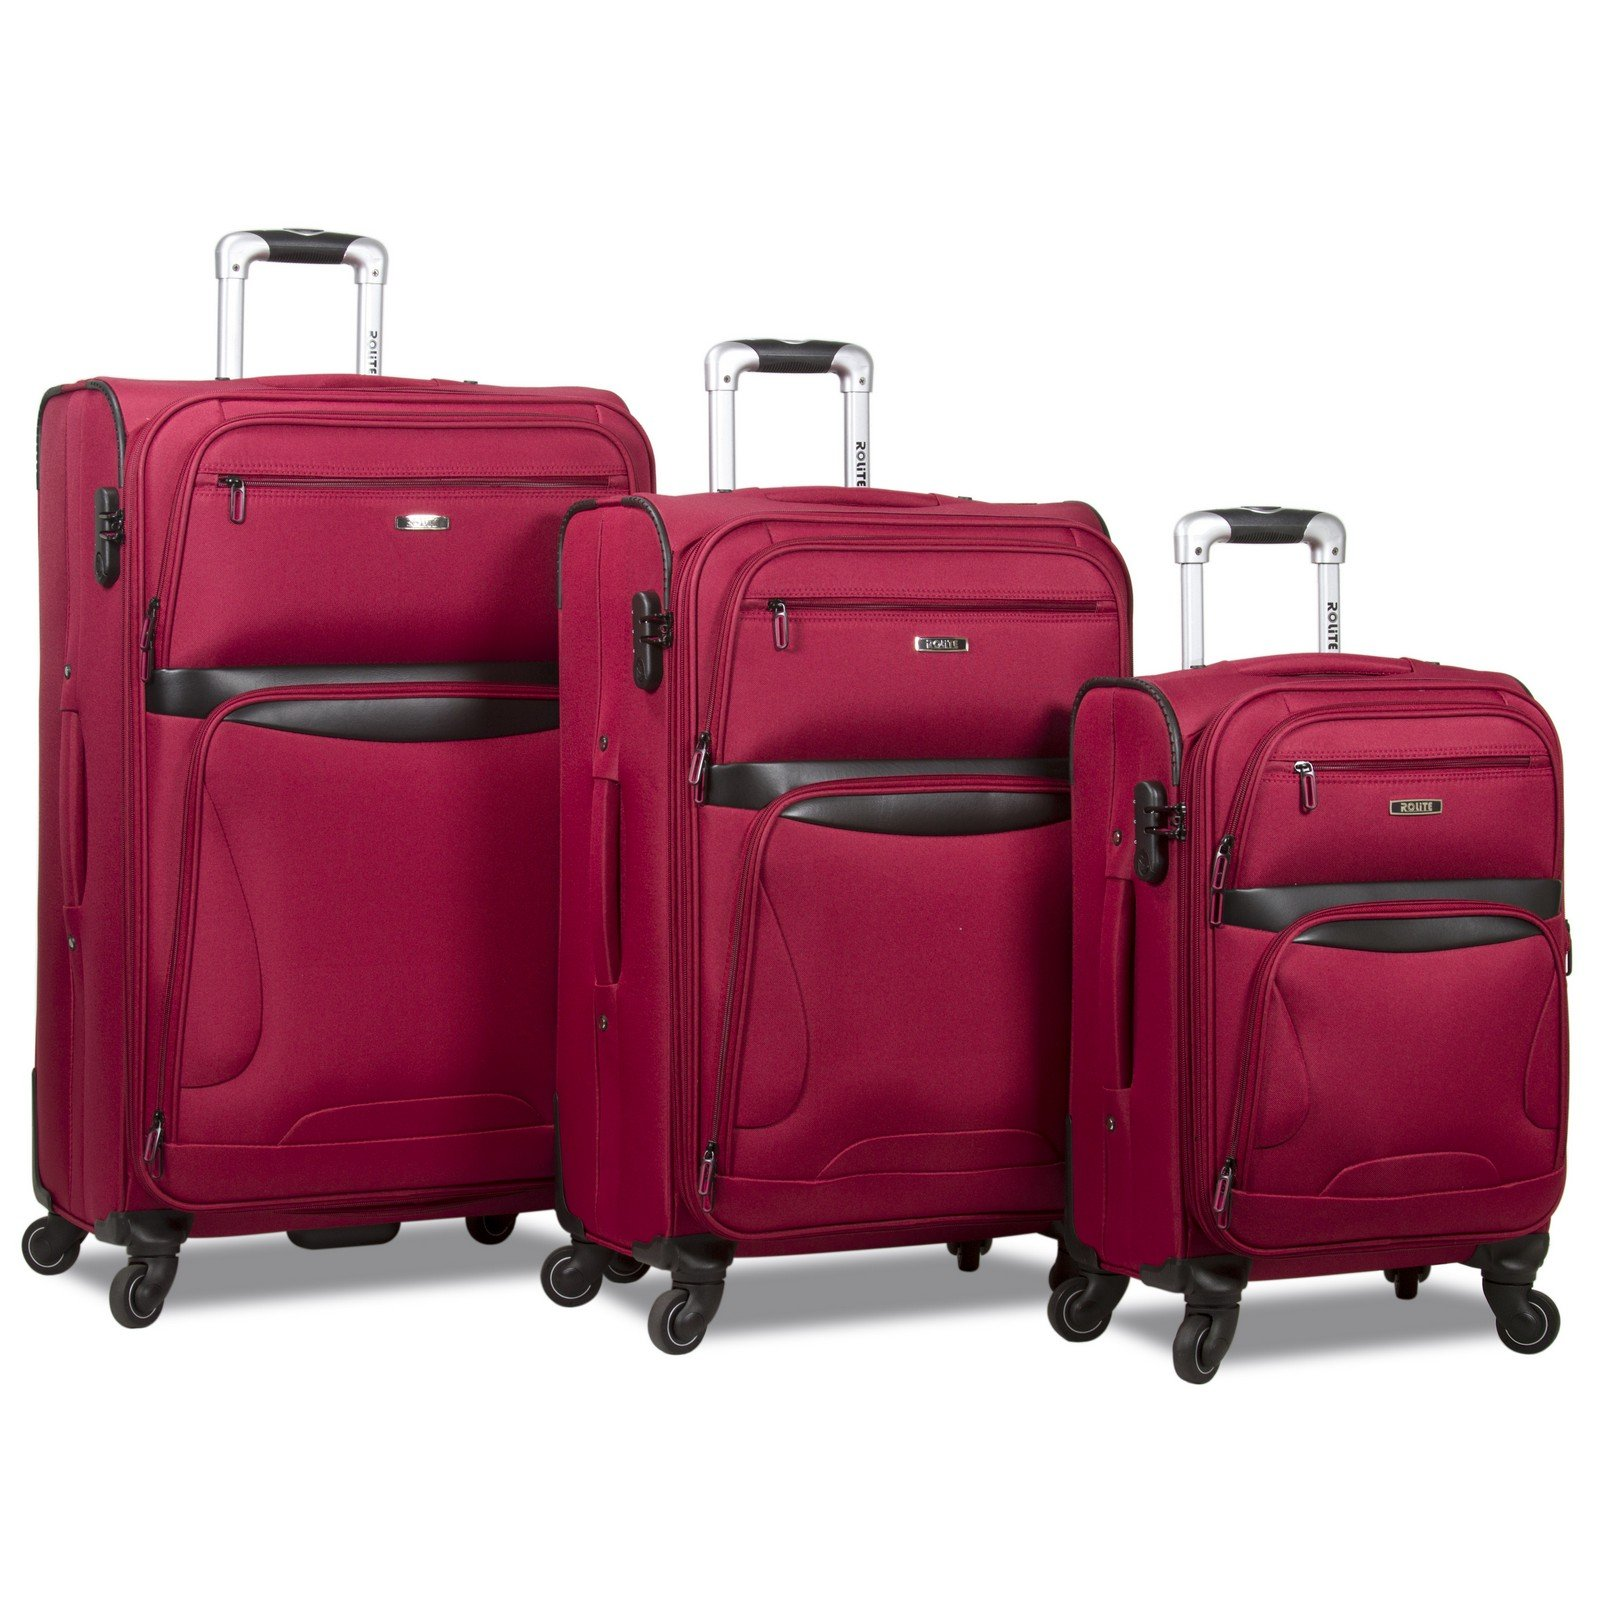 Rolite Explorer 3-Piece Expandable Spinner Luggage Set - Burgundy